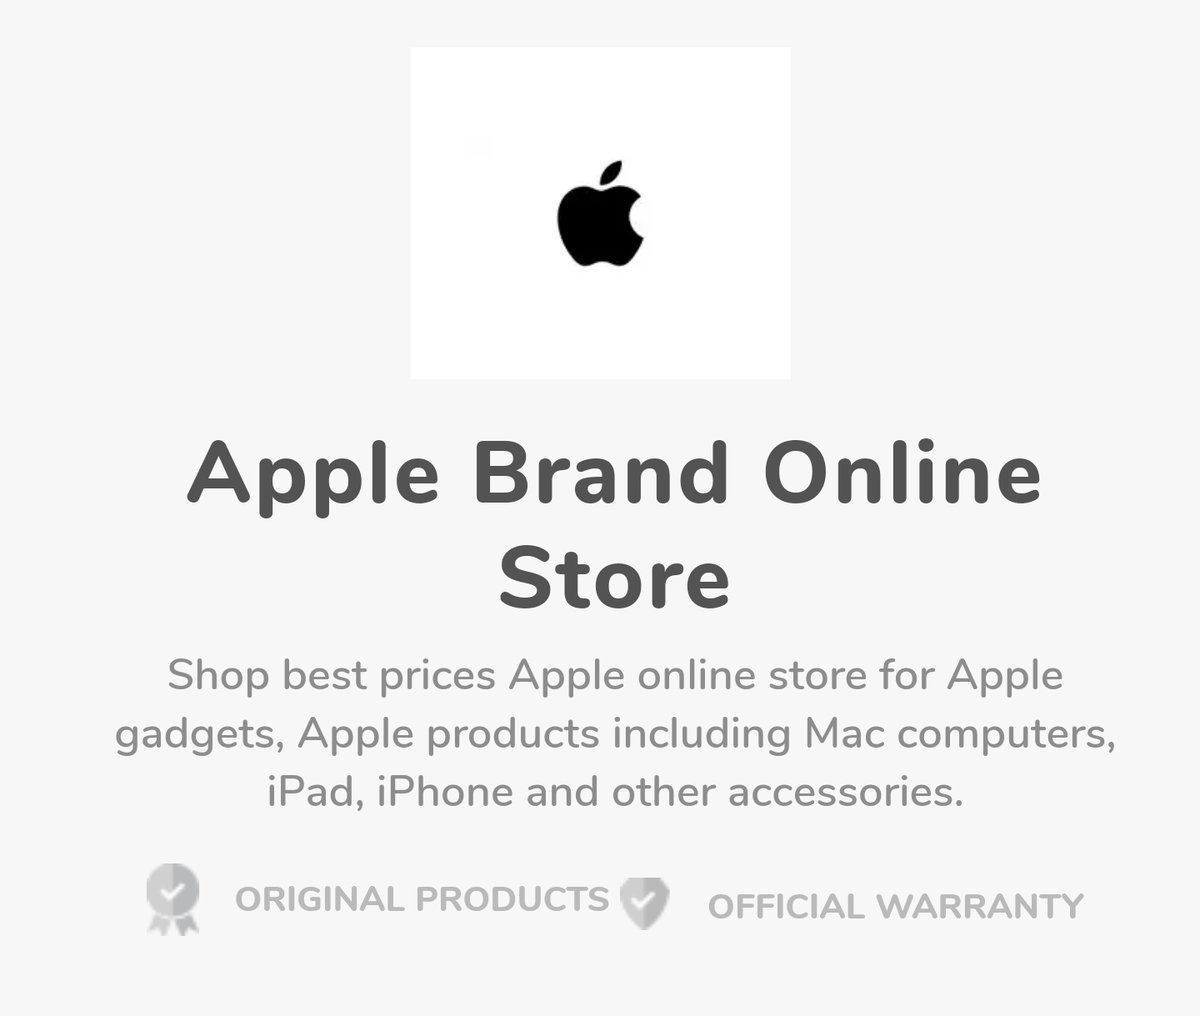 #Apple #iPhone #iPad #Mac #Macbook #Appleaccessories #Malaysia #onlinestore #zerointerest #officialwarranty https://invol.co/cllu6apic.twitter.com/sadeBQjtfi